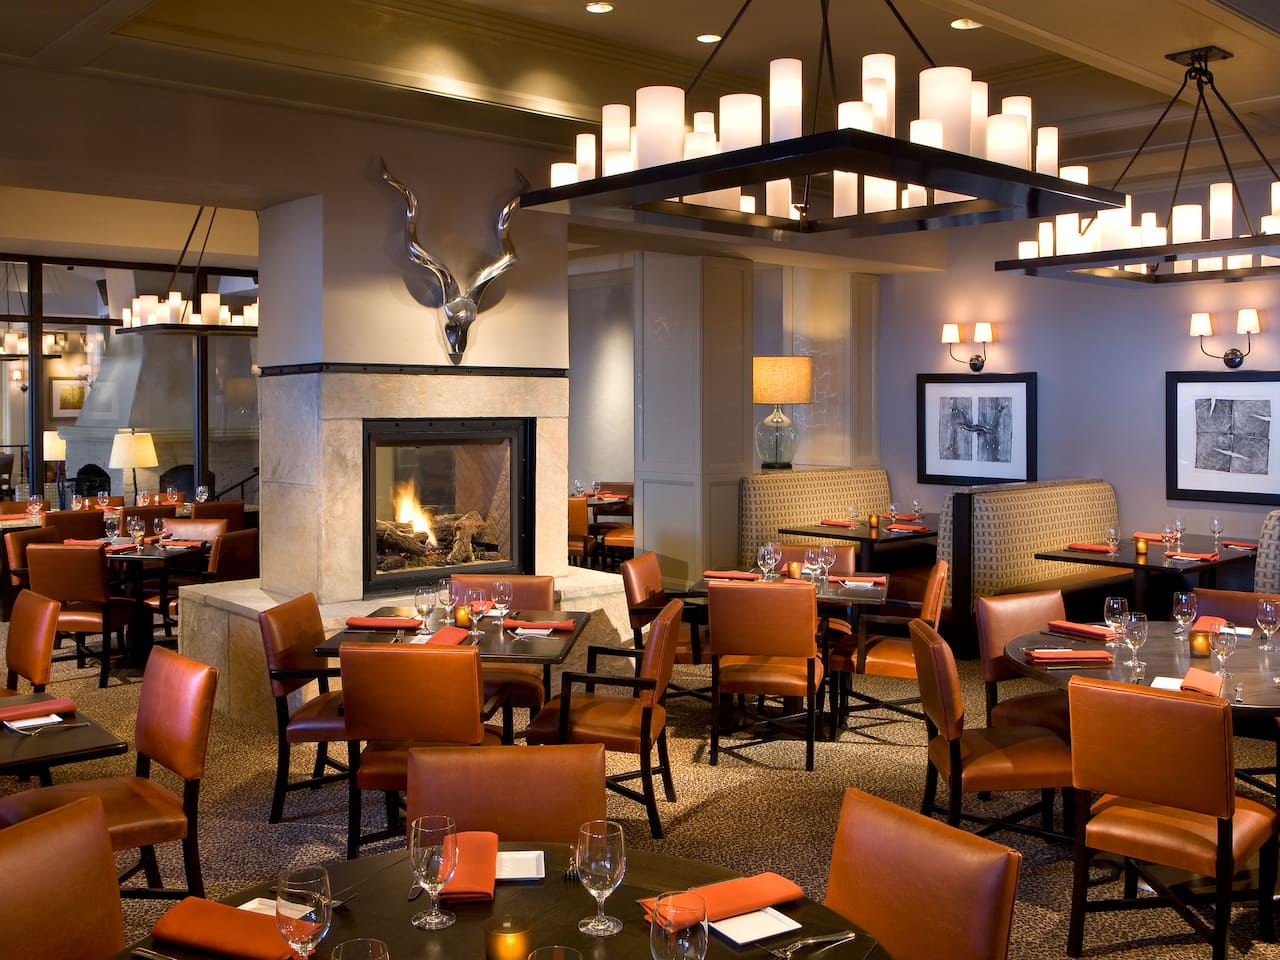 8100 Mountainside Bar & Grill Open Kitchen Grill Park Hyatt Beaver Creek Resort and Spa